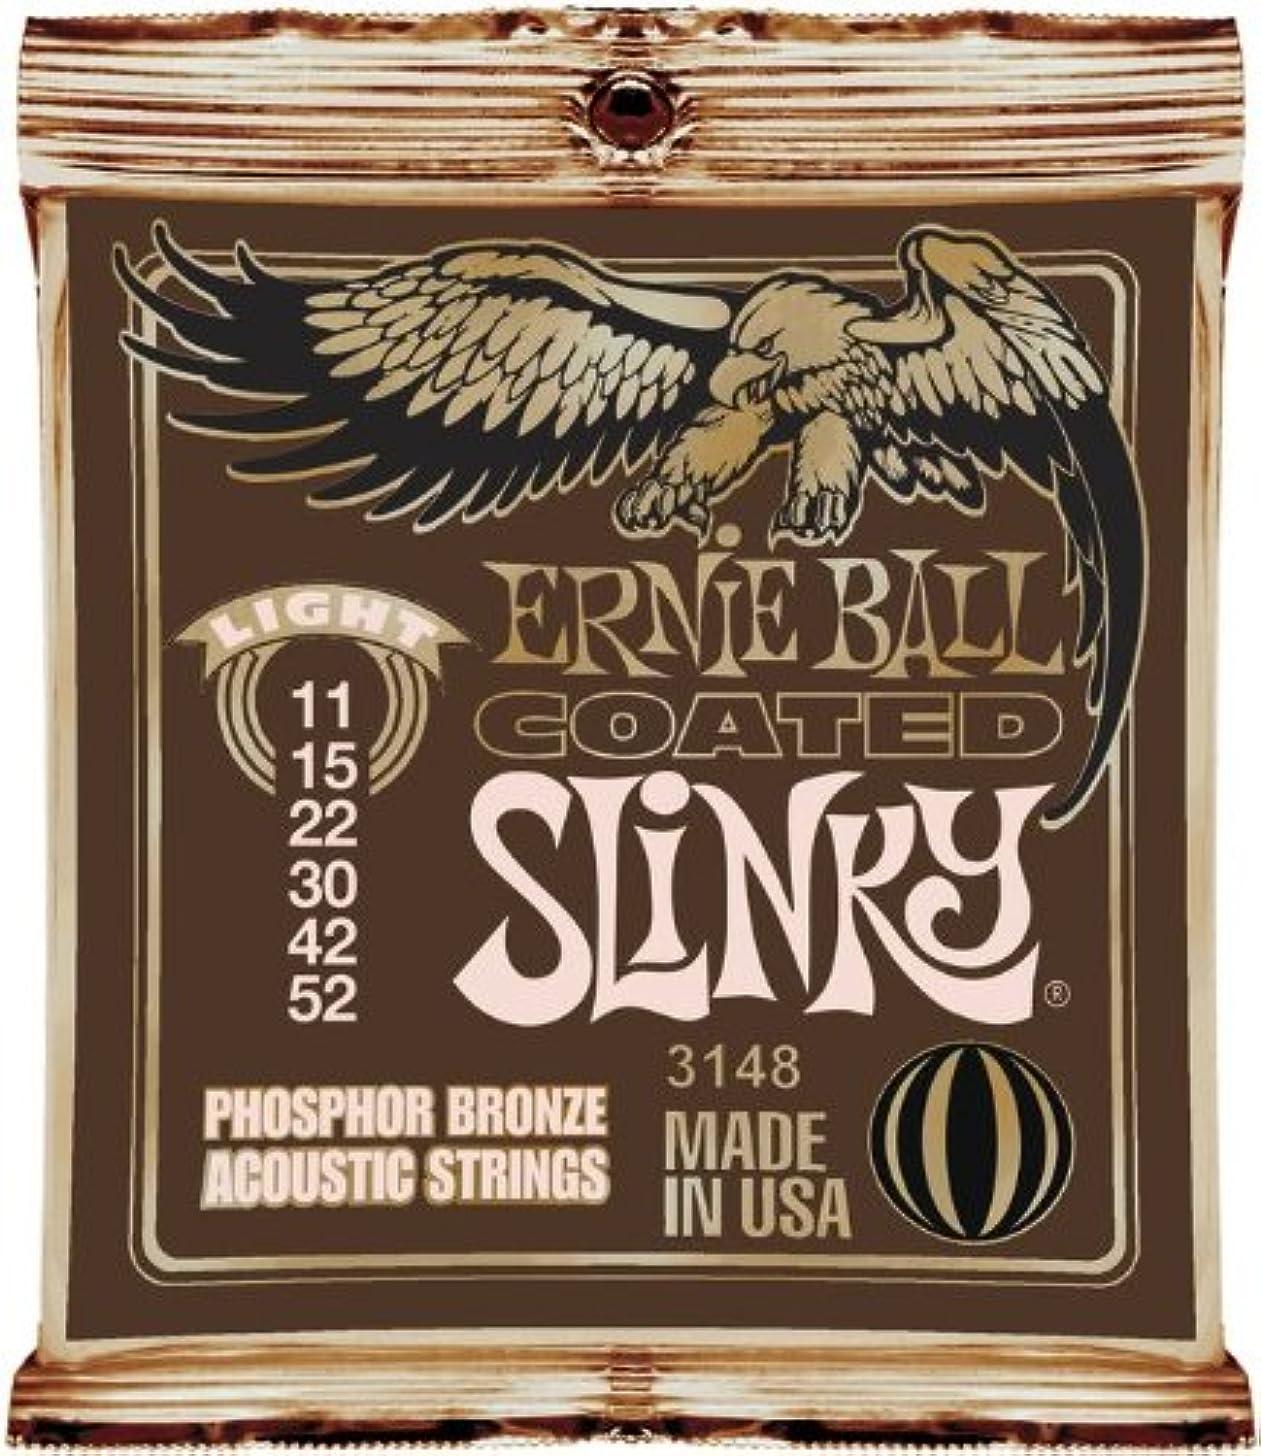 Ernie Ball 3148 Coated Slinky Acoustic Guitar Strings | Light